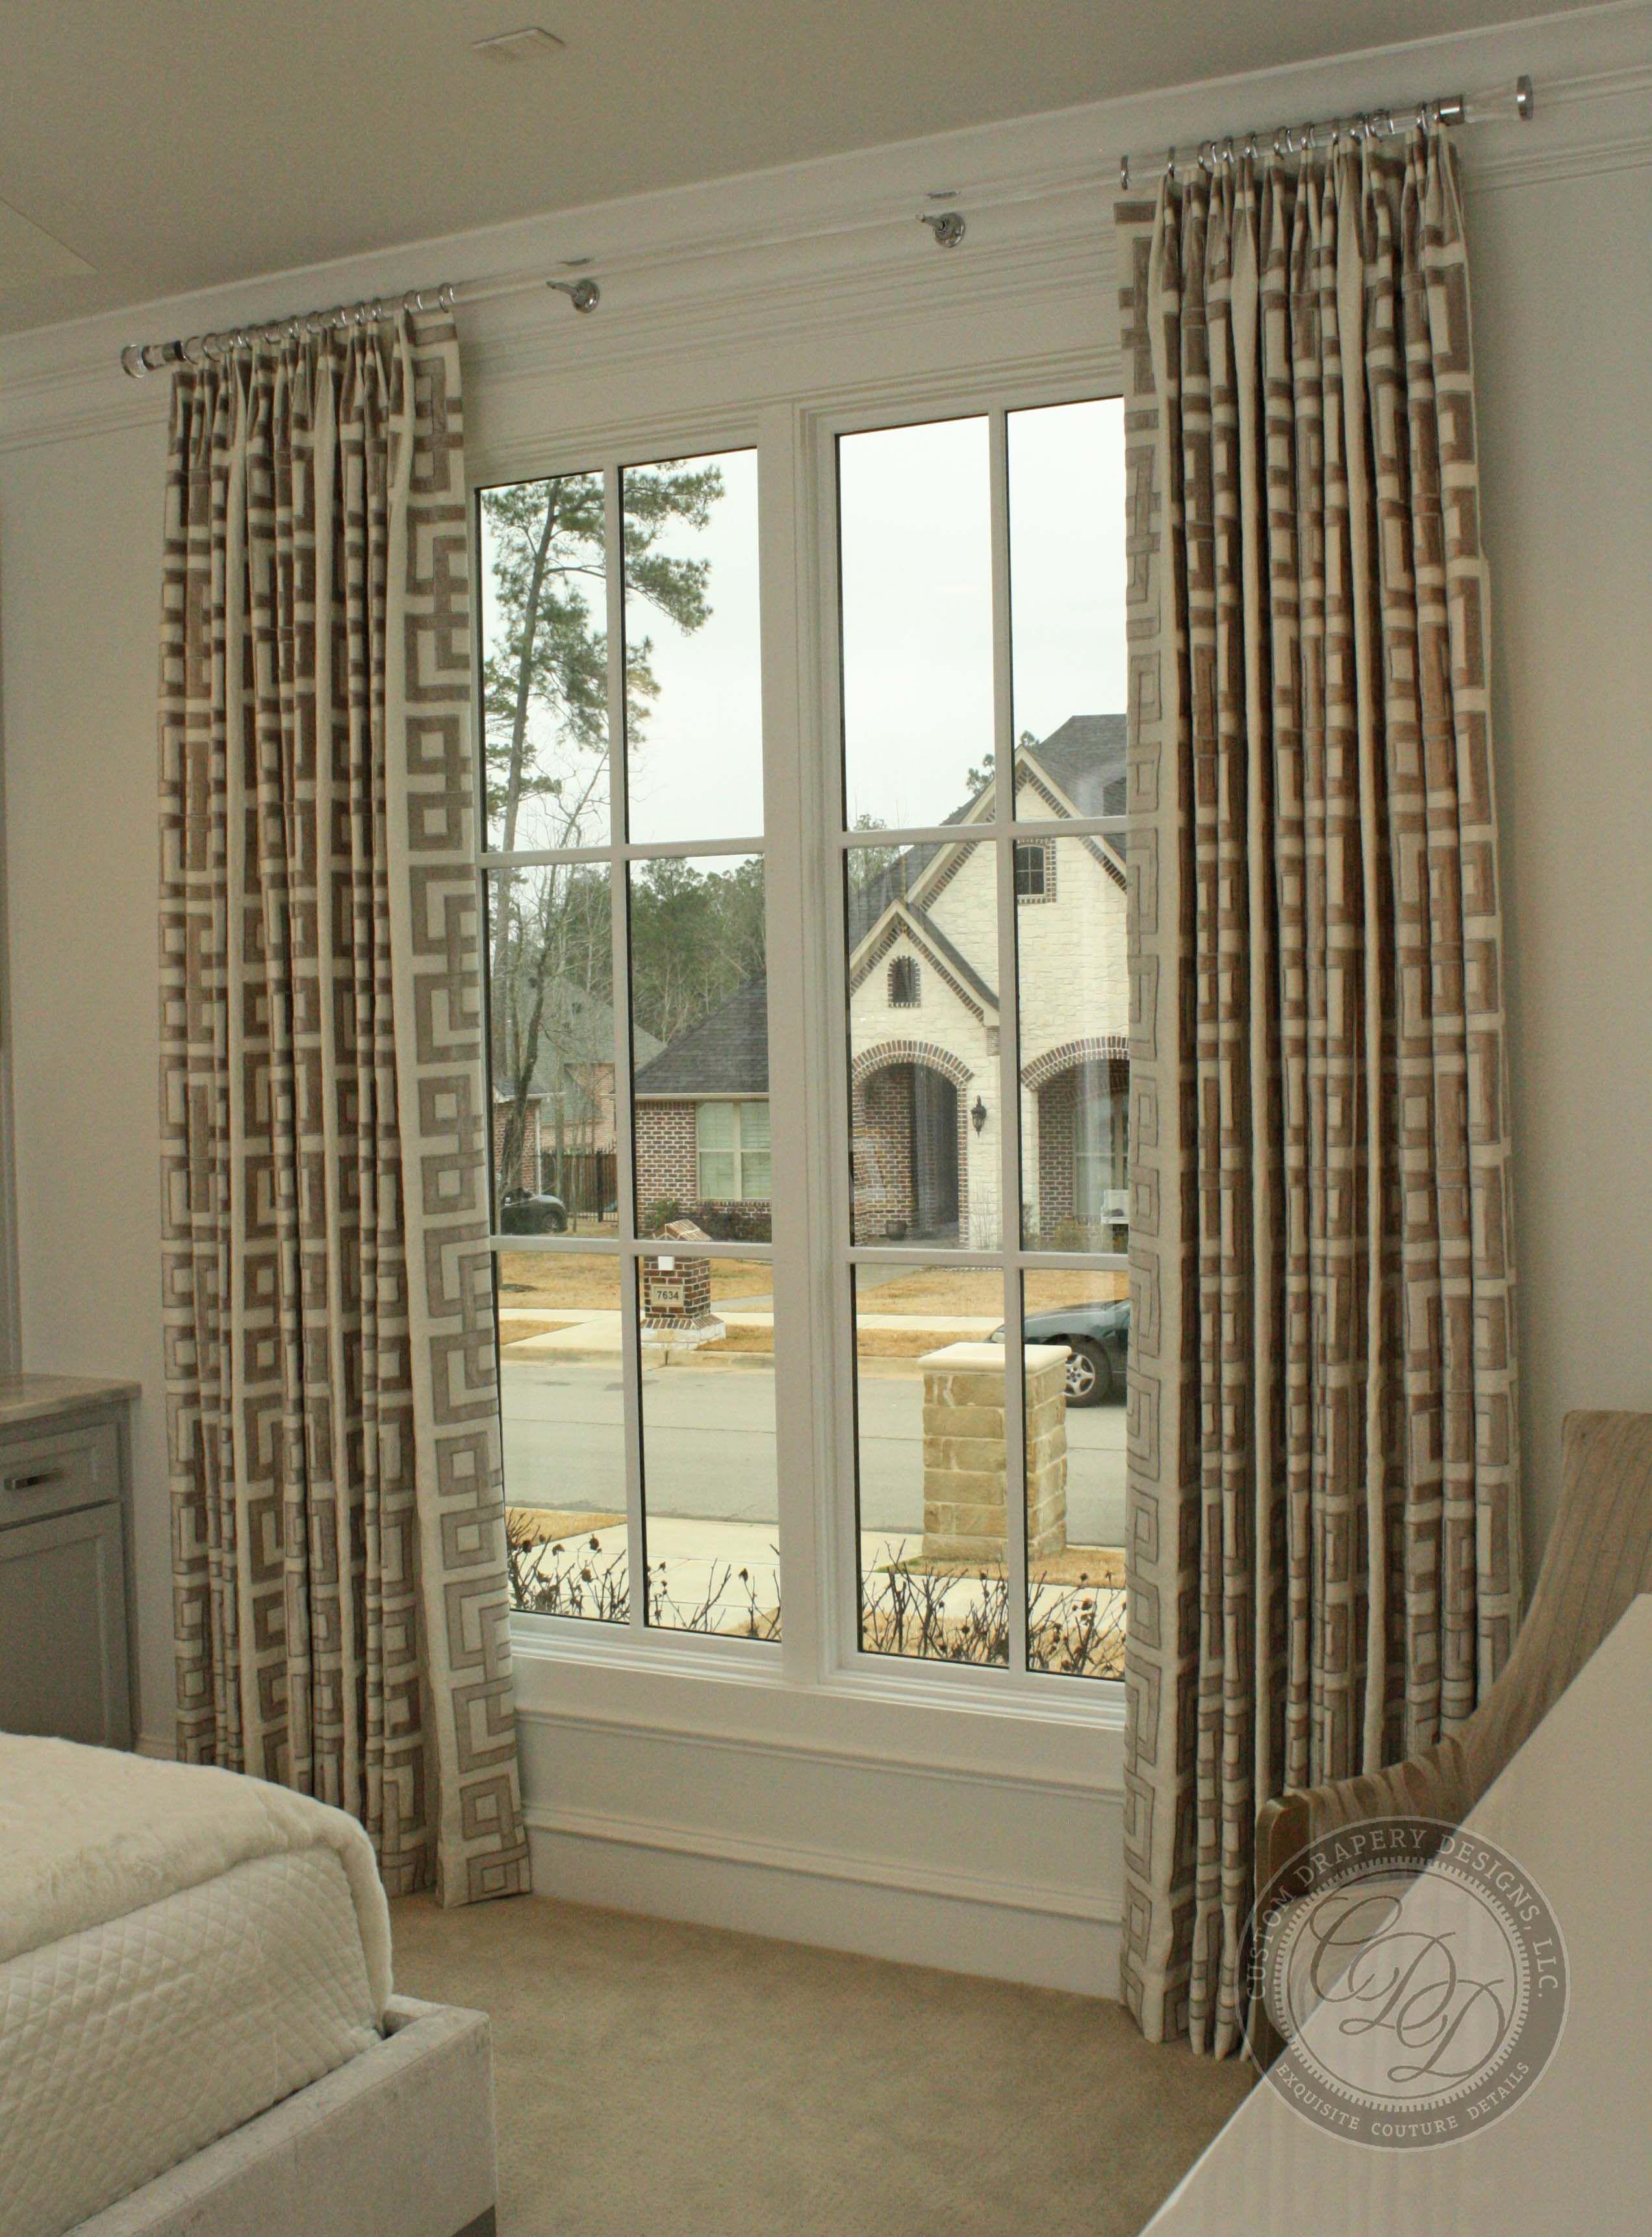 Custom Drapery Designs Llc Guest Bedroom Windows Dressed In A